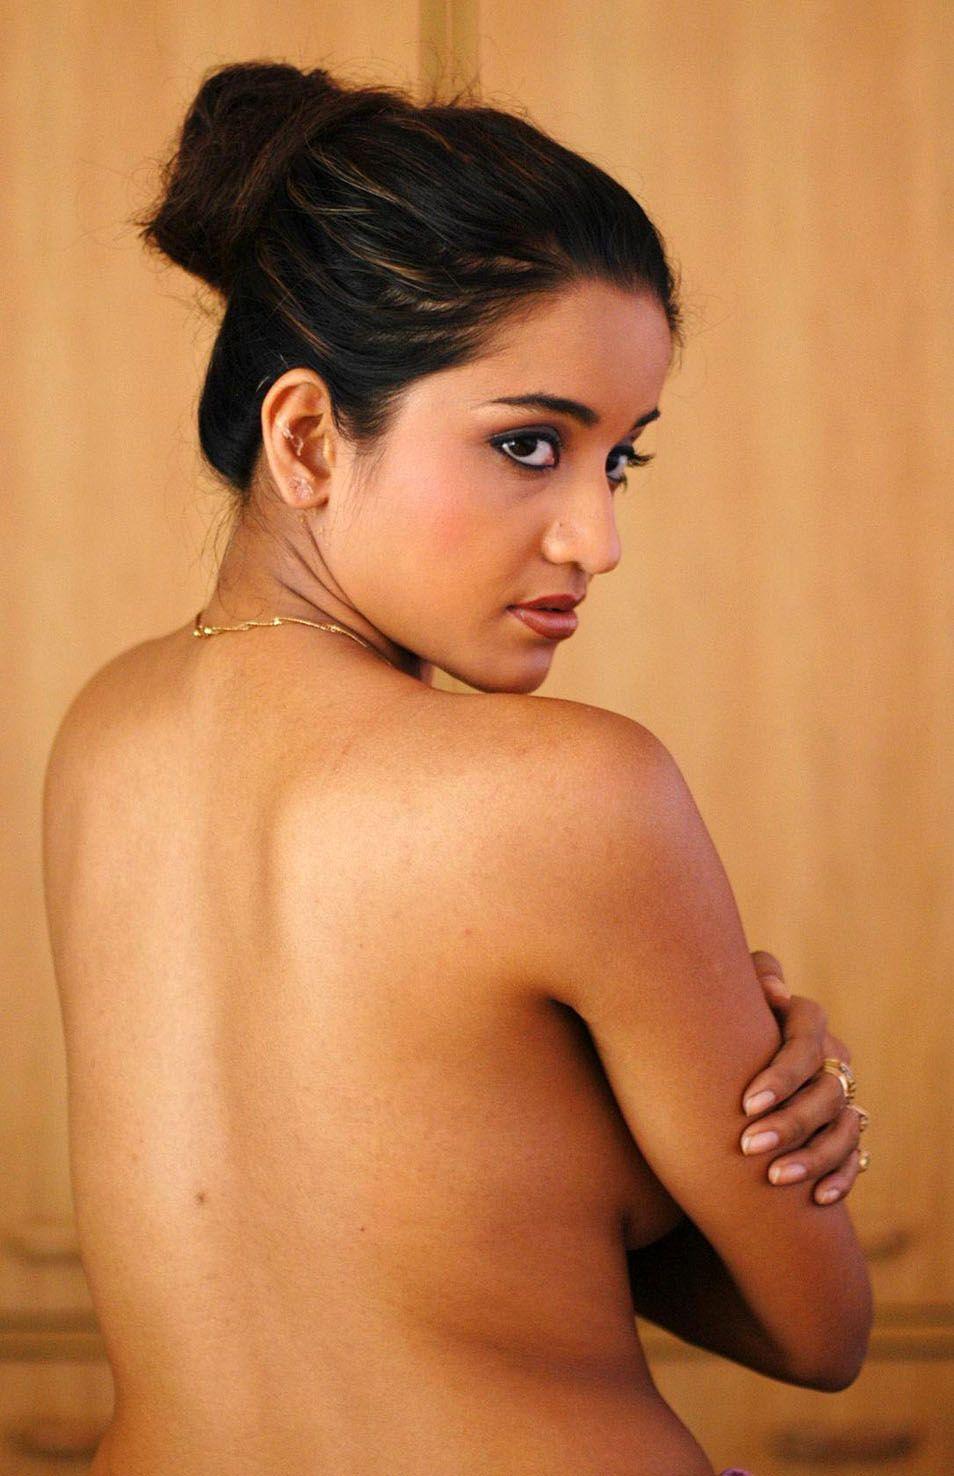 Wallpapers, Kamapisachi Actors: Indian Actress Don't Wear Clothes ...